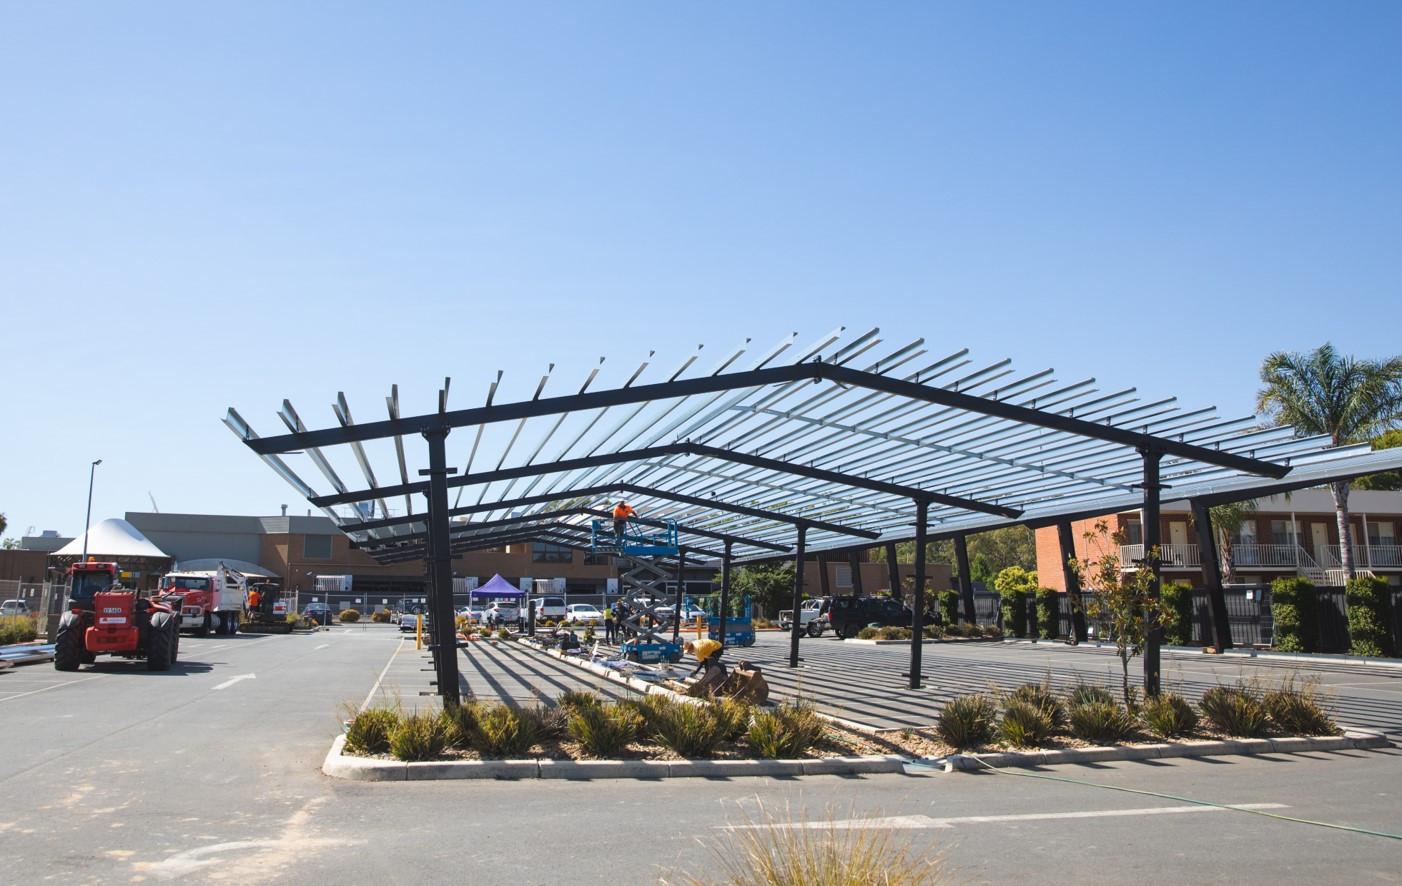 VCE_solar carpark 9.jpg